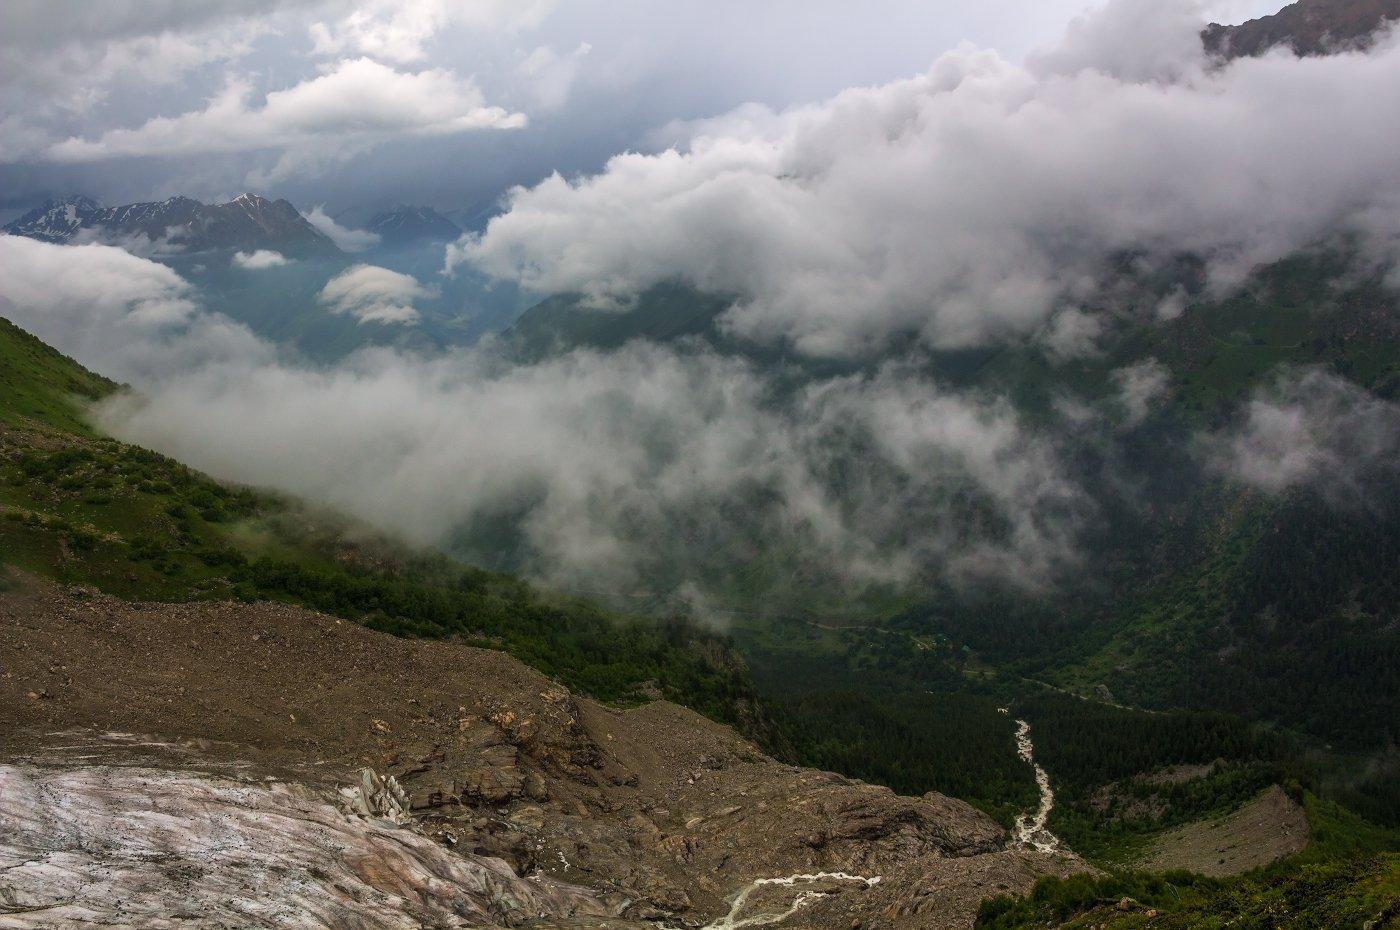 горы, туман, облака, Эстелла